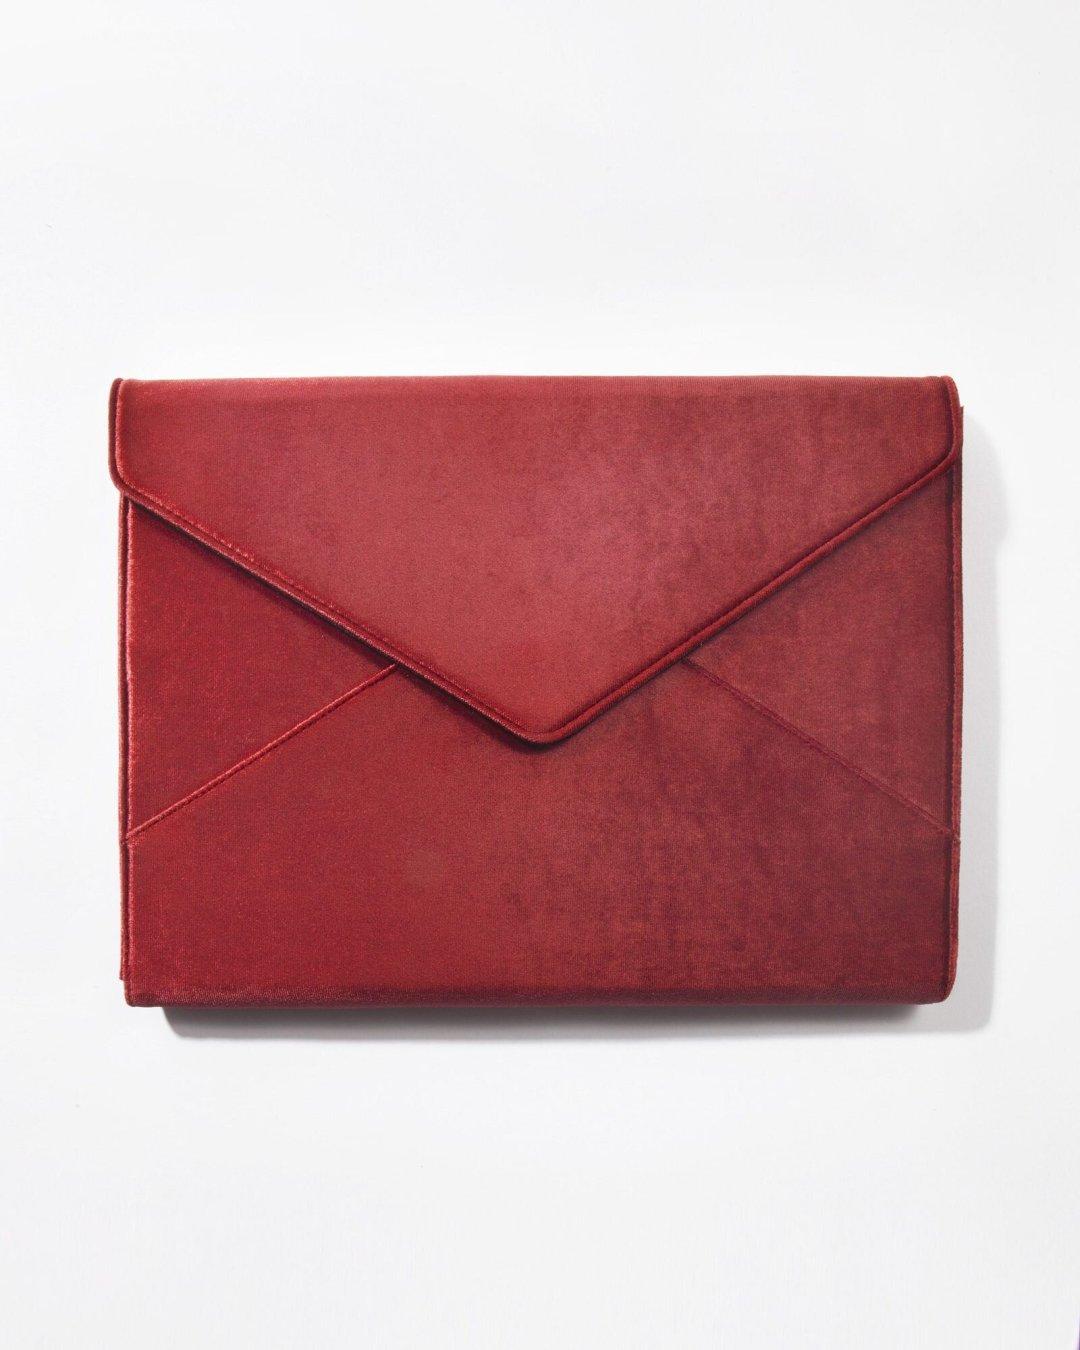 Sonix Velvet 13-inch laptop clutch